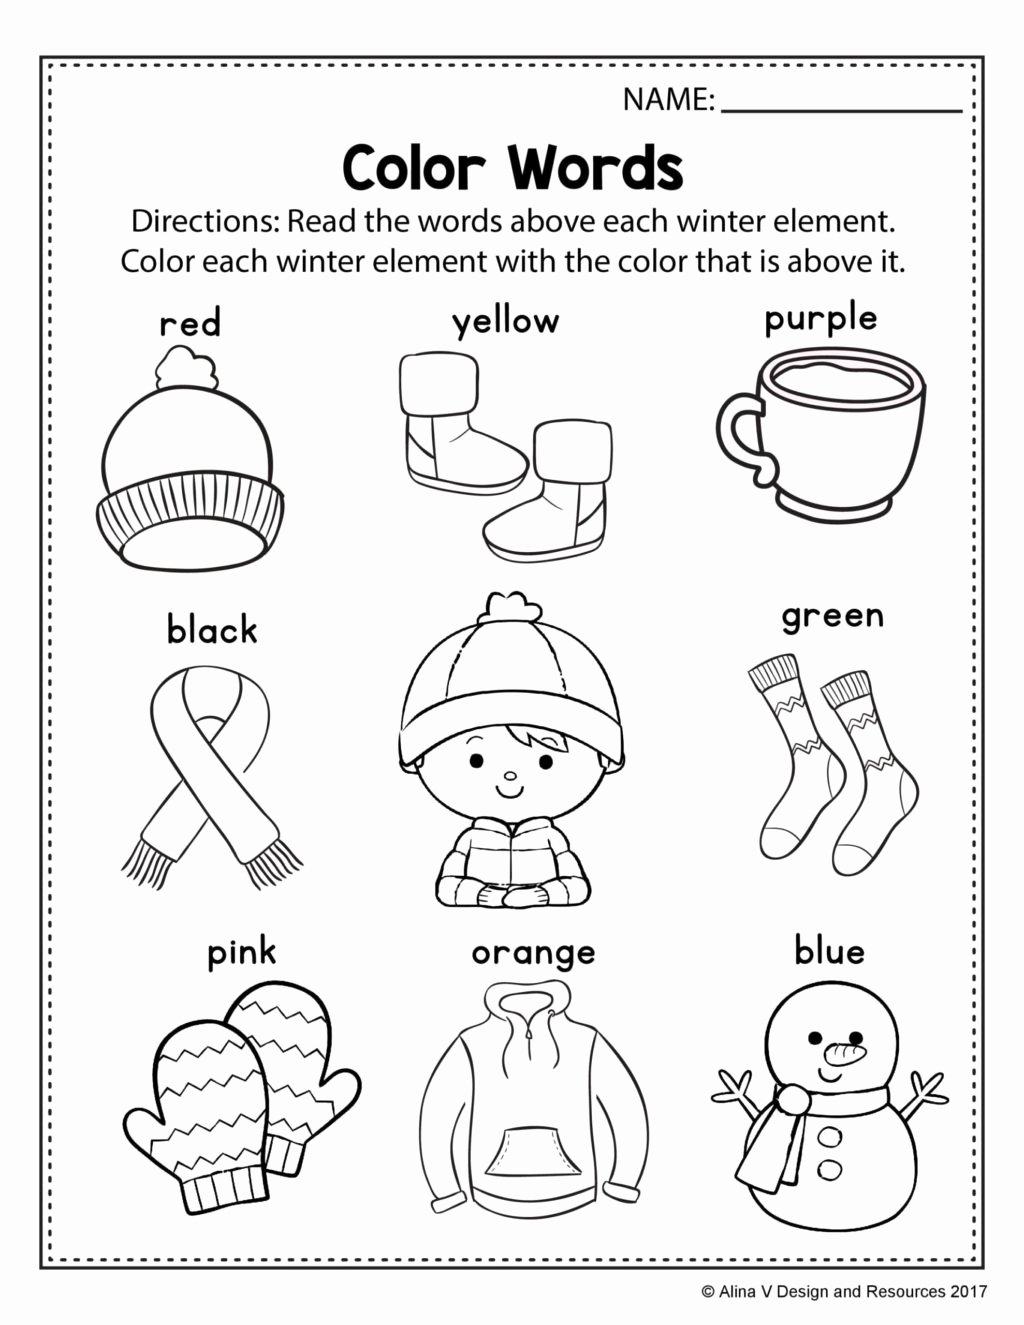 Coloring Worksheets for Preschoolers Fresh Worksheet astonishing Coloring Worksheets for Kindergarten